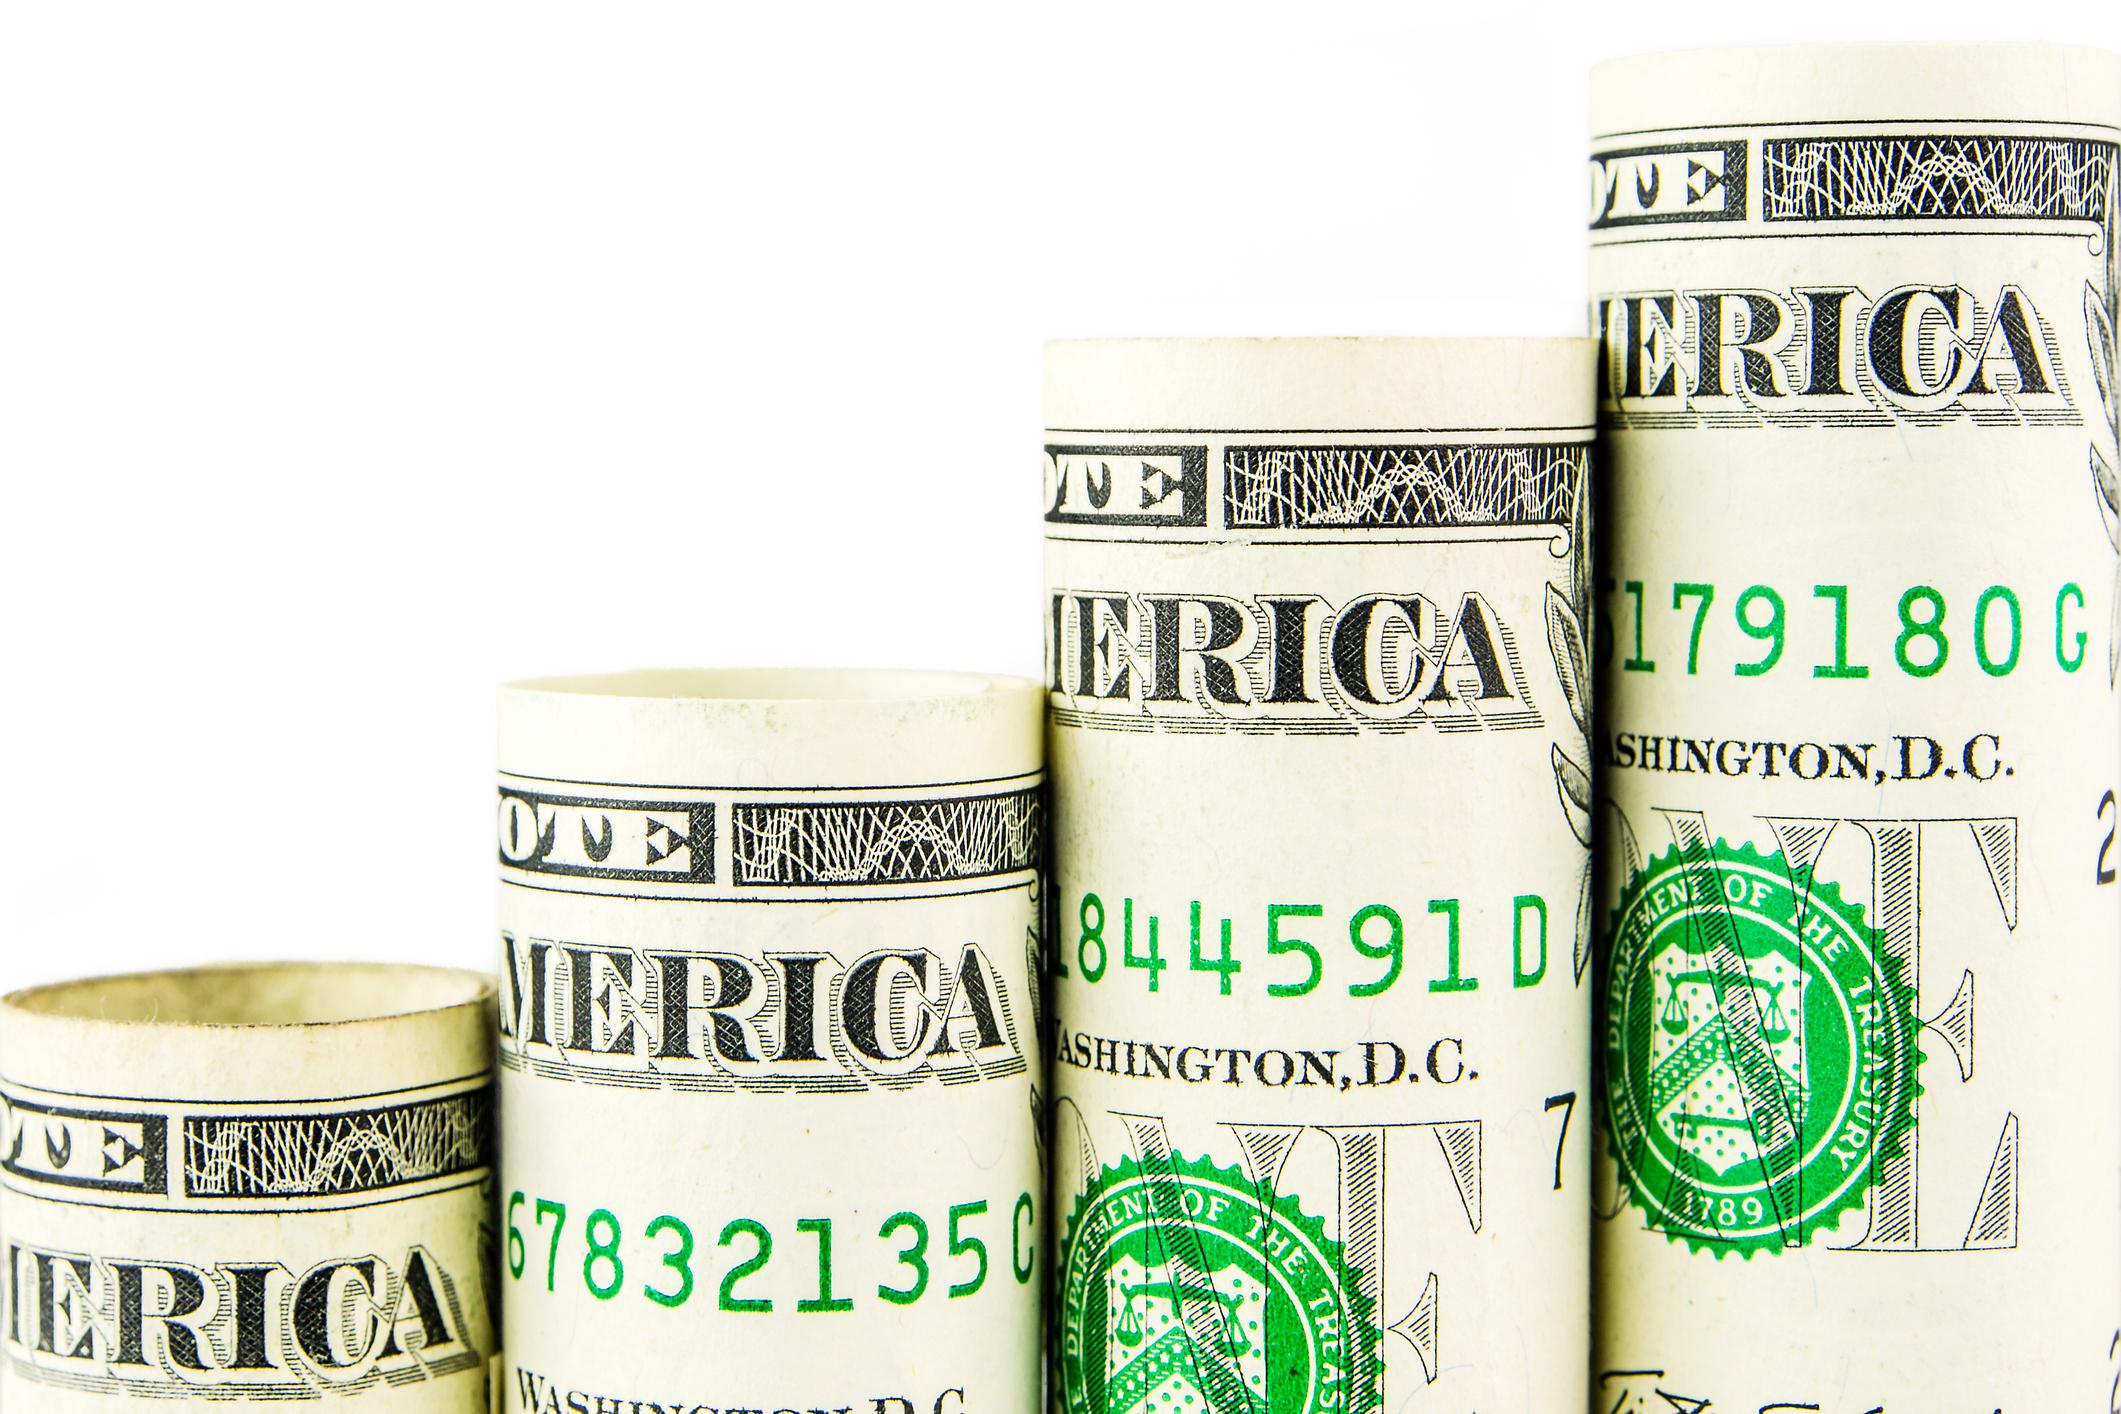 Rolls of dollar bills rising in a stair-step manner